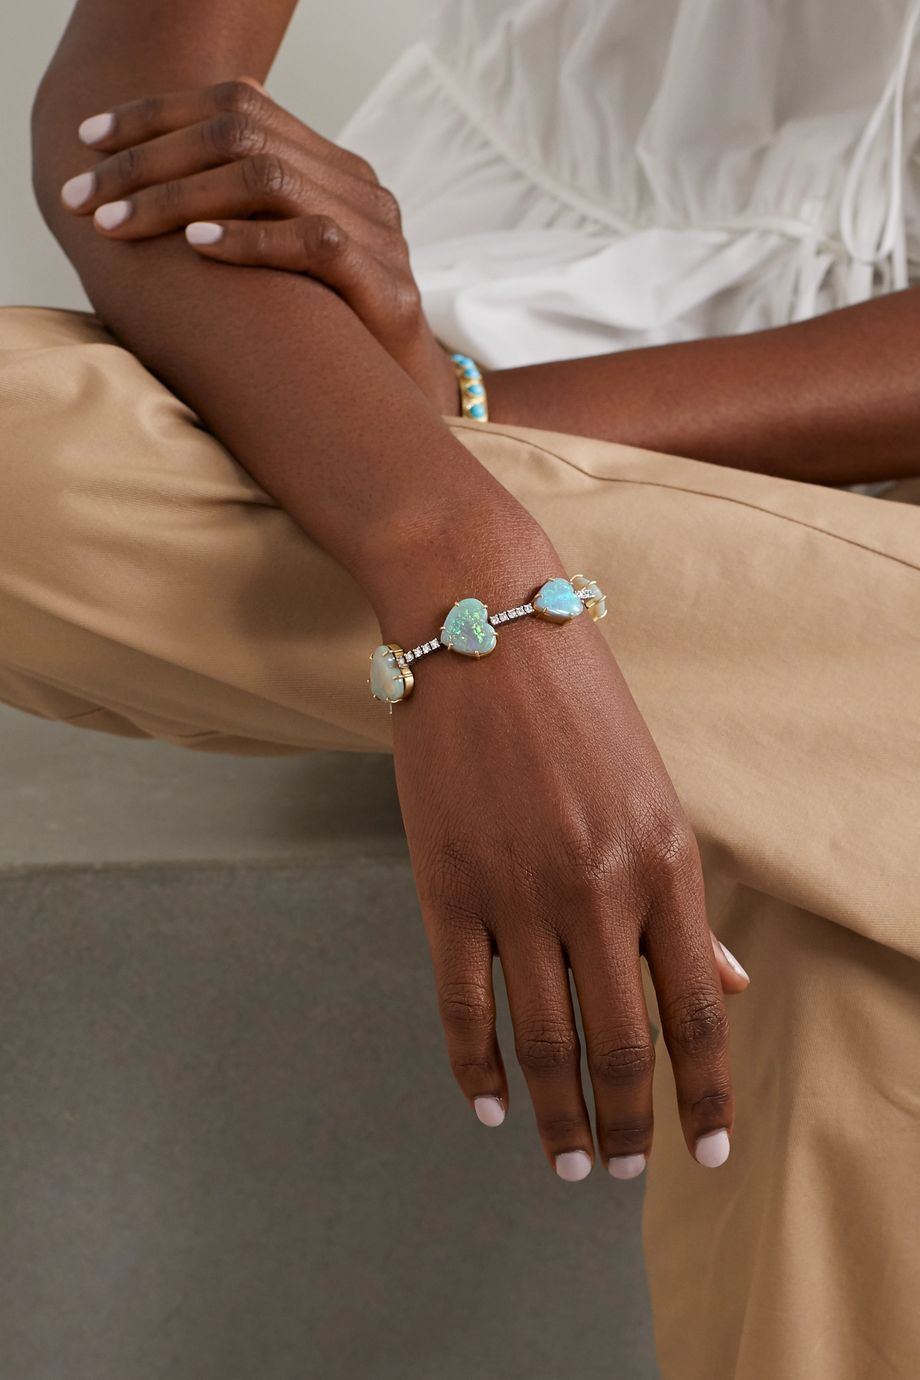 Irene Neuwirth Love 18-karat yellow and white gold, opal and diamond bracelet